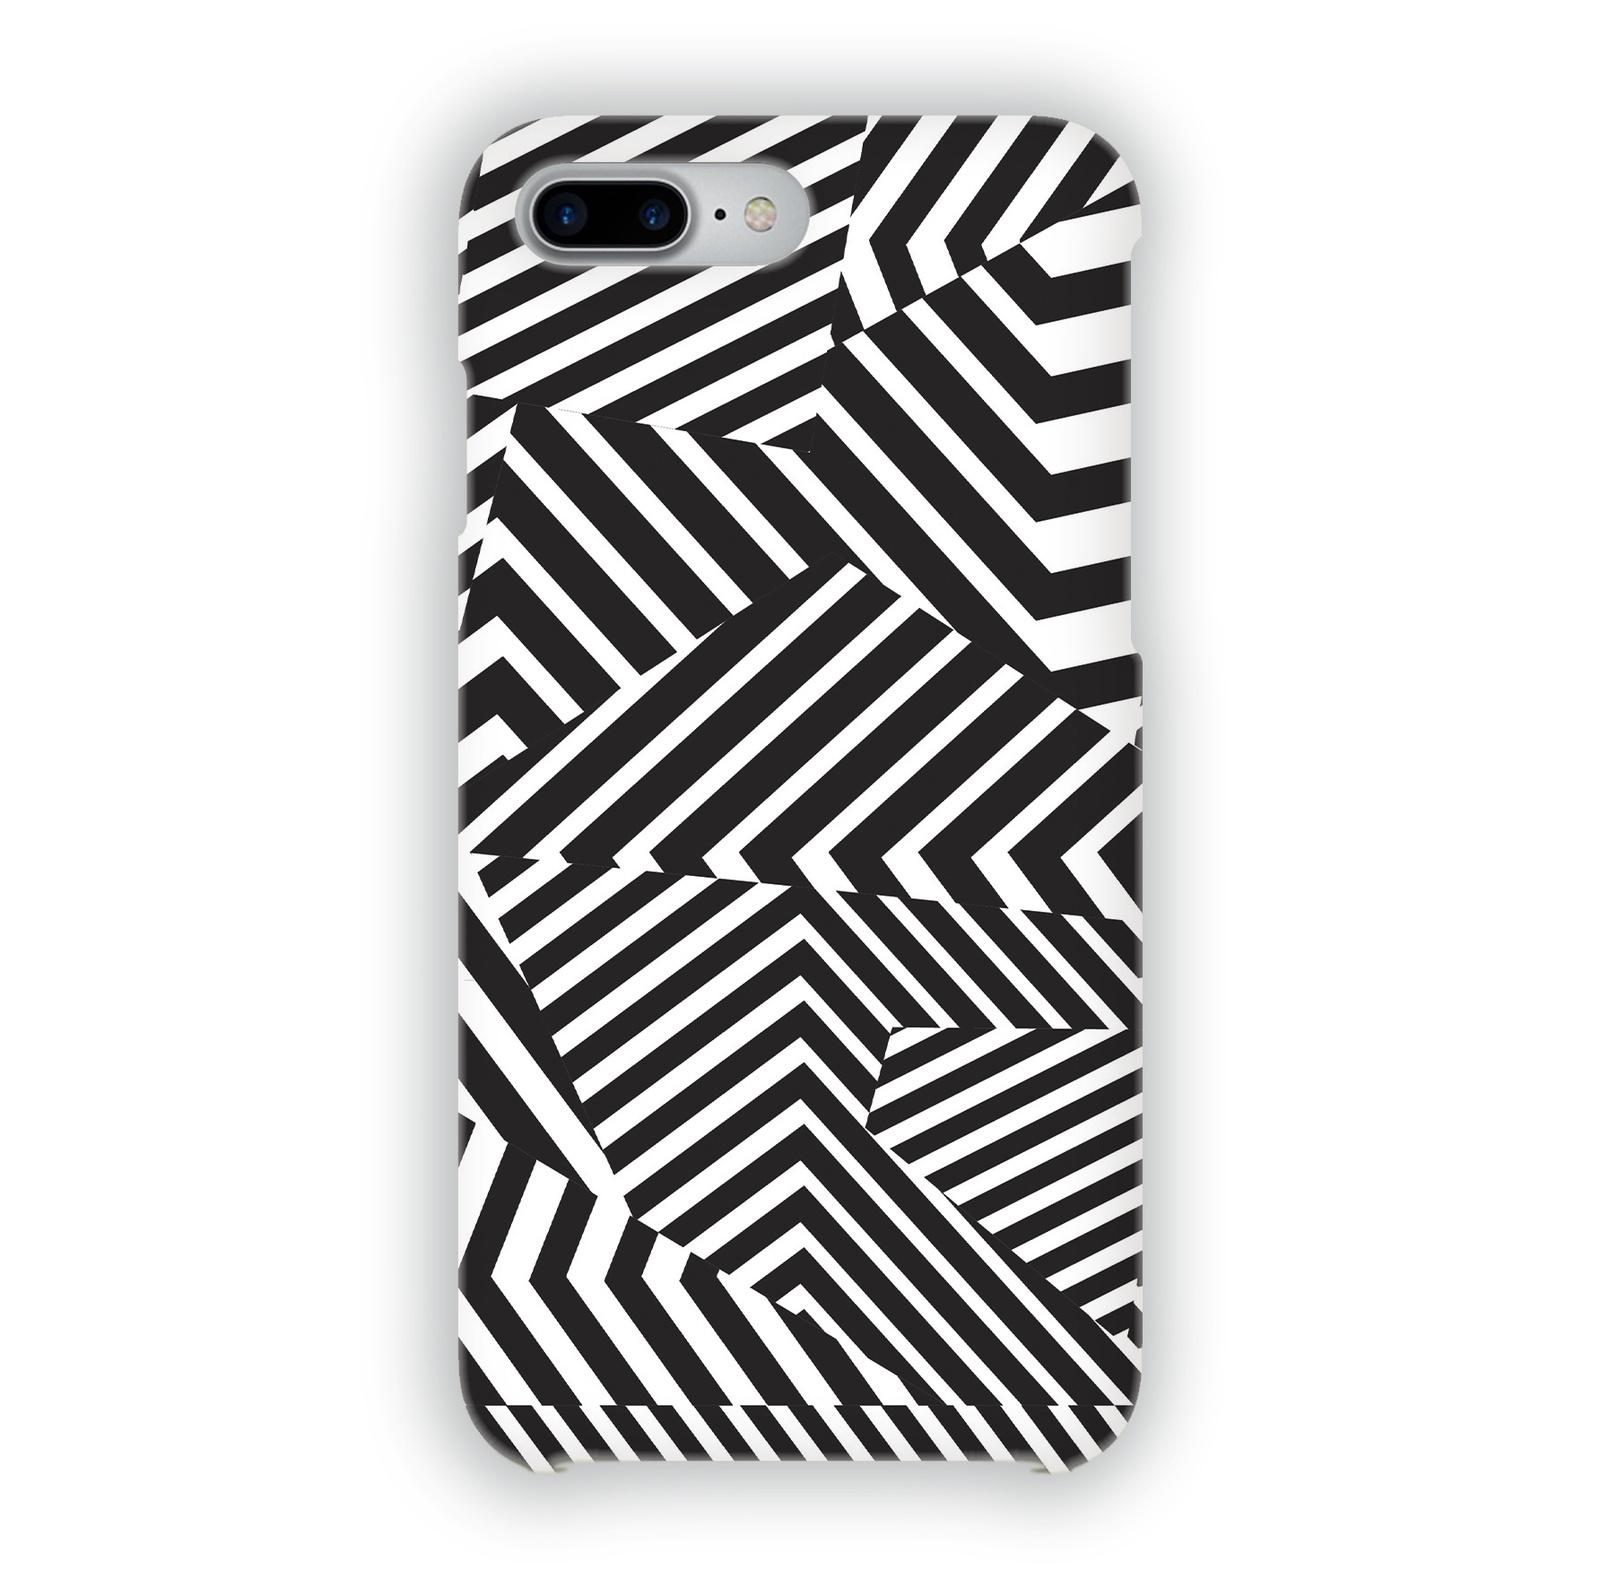 "Чехол Mitya Veselkov ""Черно-белая геометрия"" для iPhone 7 Plus/8 Plus, IP7PLUS.MITYA-026, черный, белый"